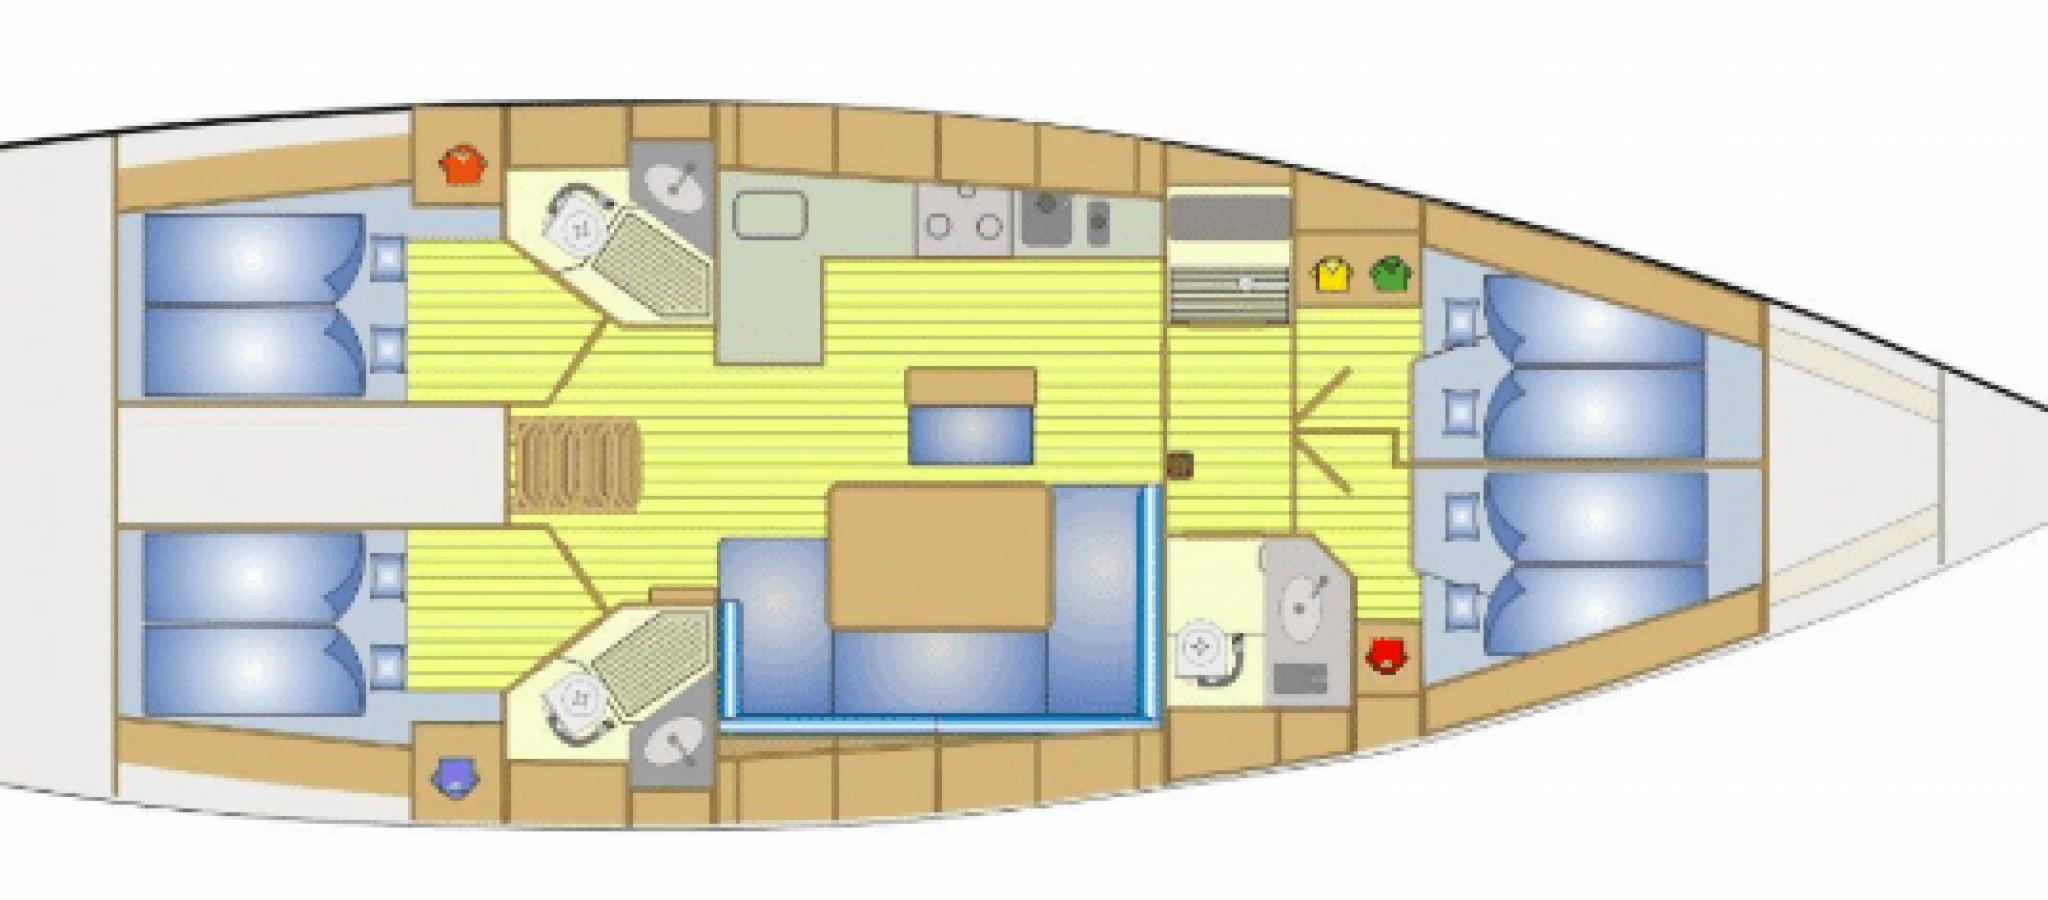 Bavaria 46 cruiser plan 4 cabines